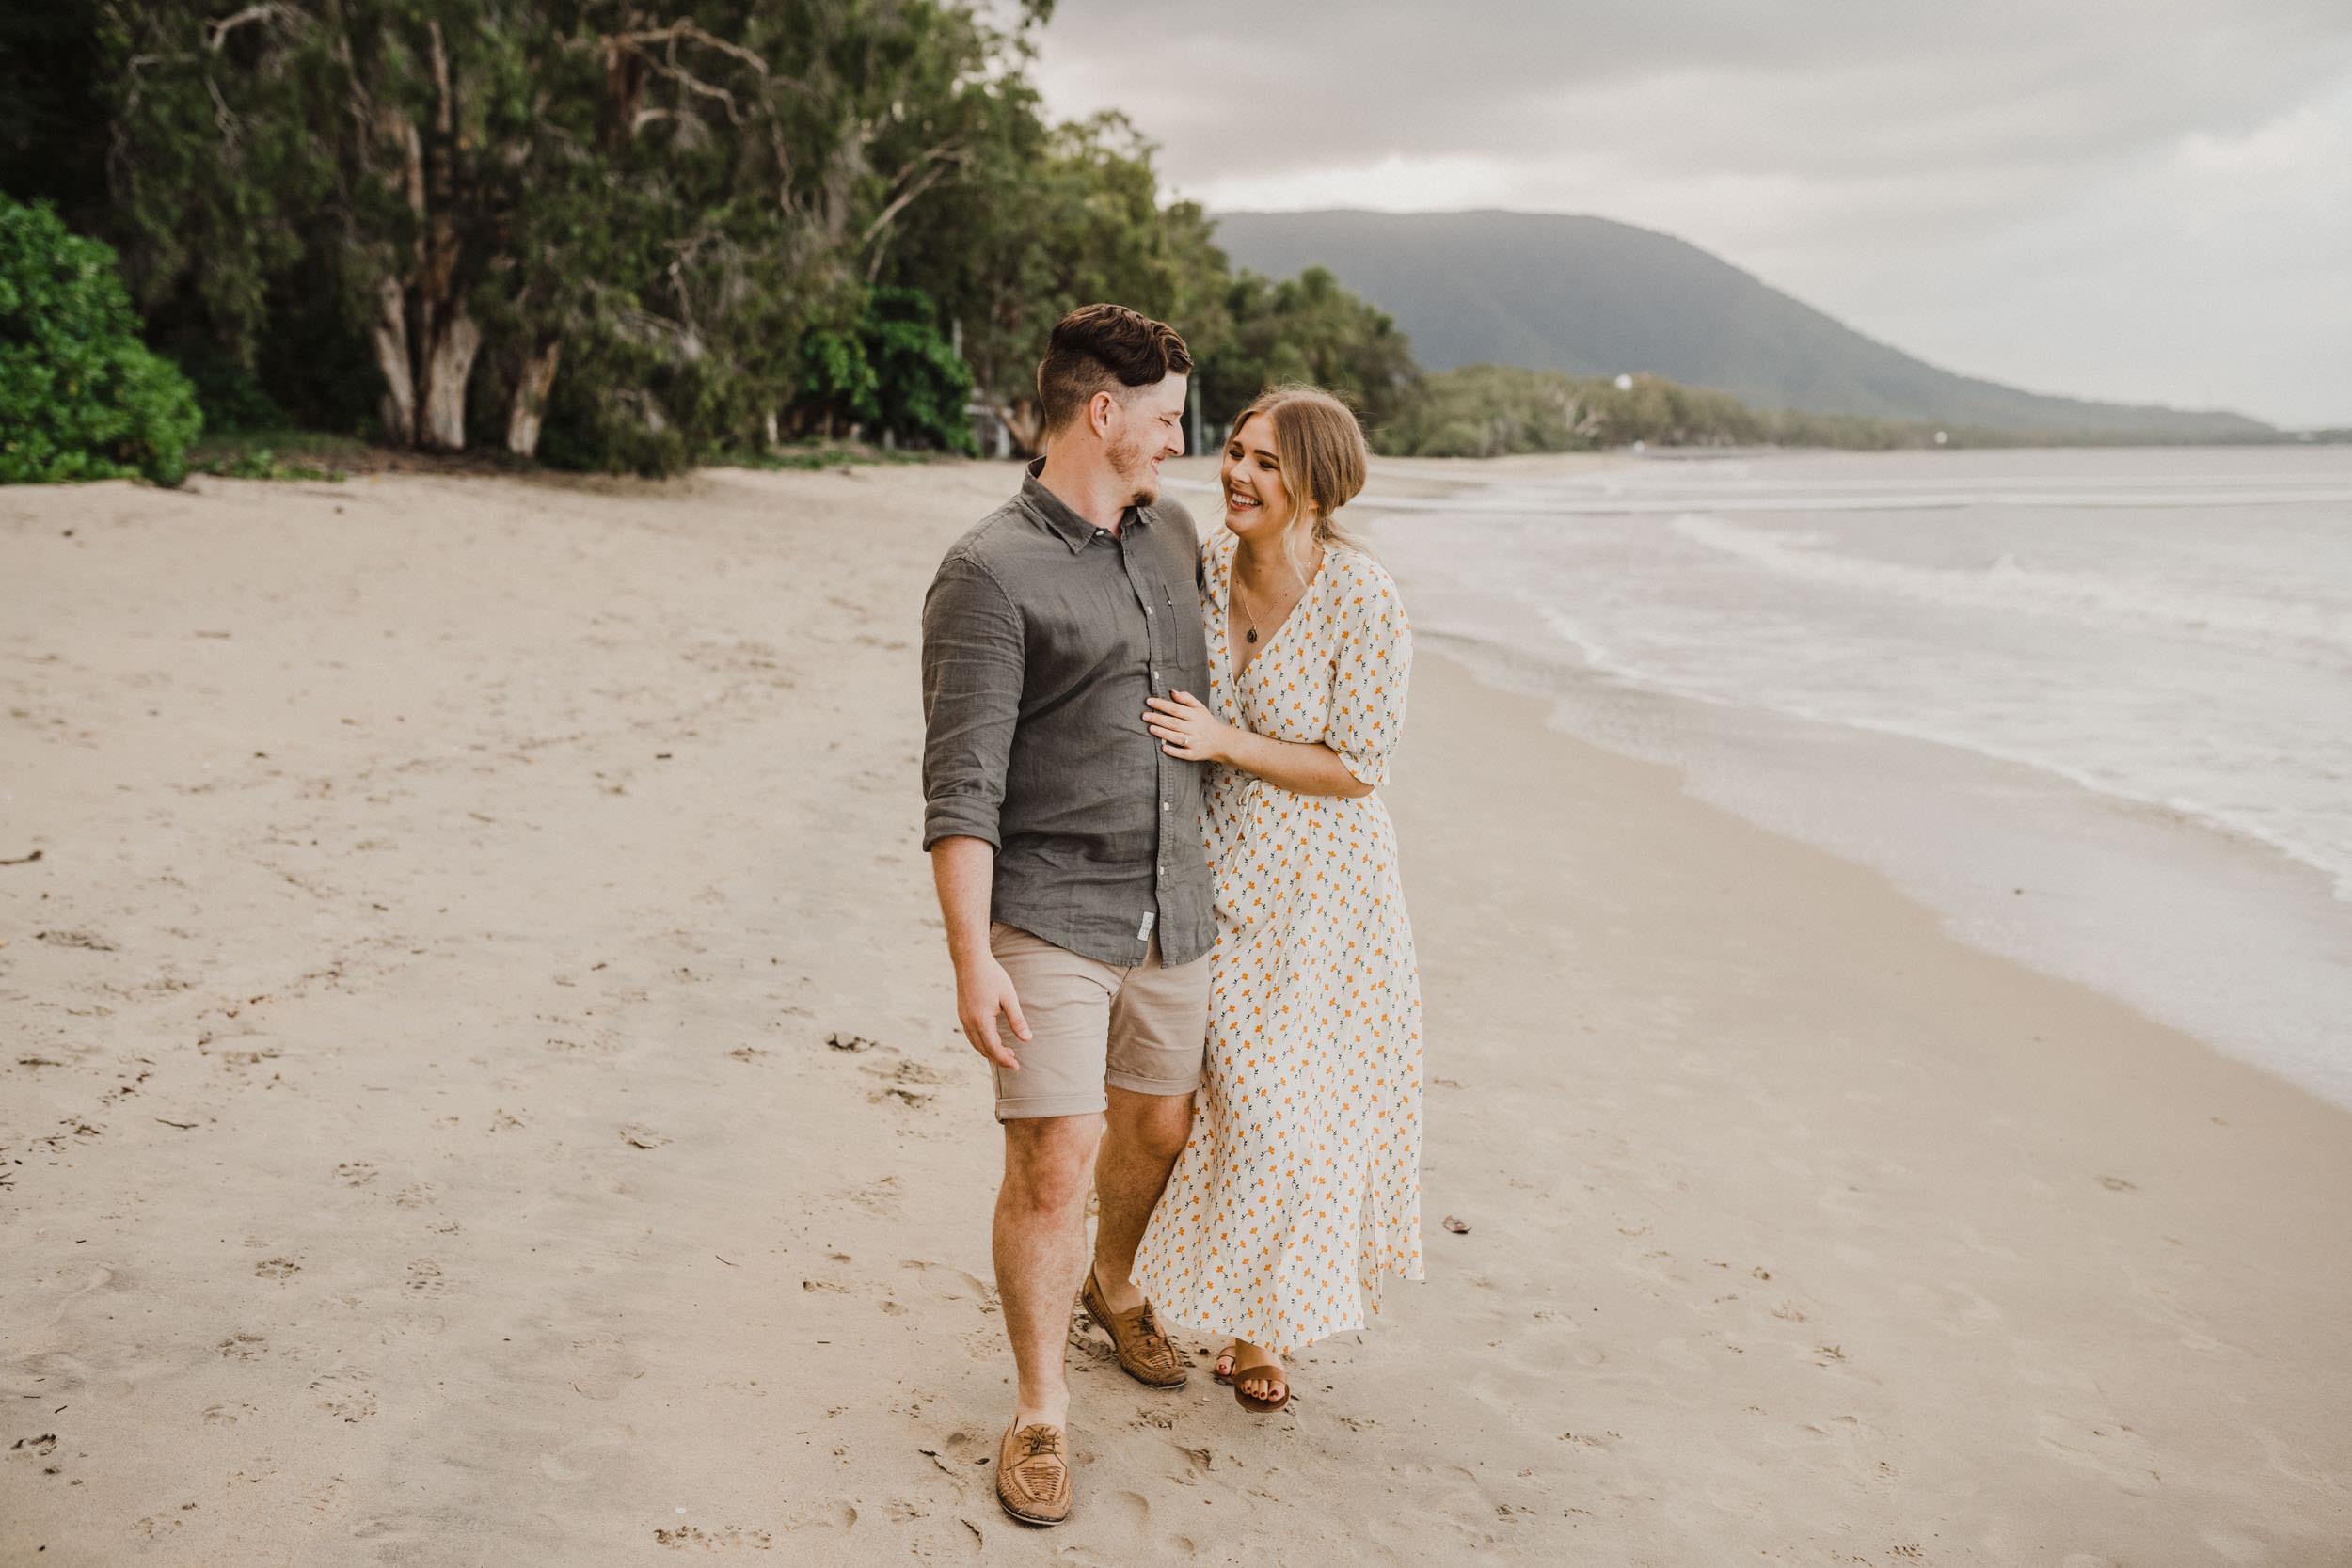 The Raw Photographer - Cairns Wedding Photographer - Beach Engagement Shoot - Candid Picnic-18.jpg